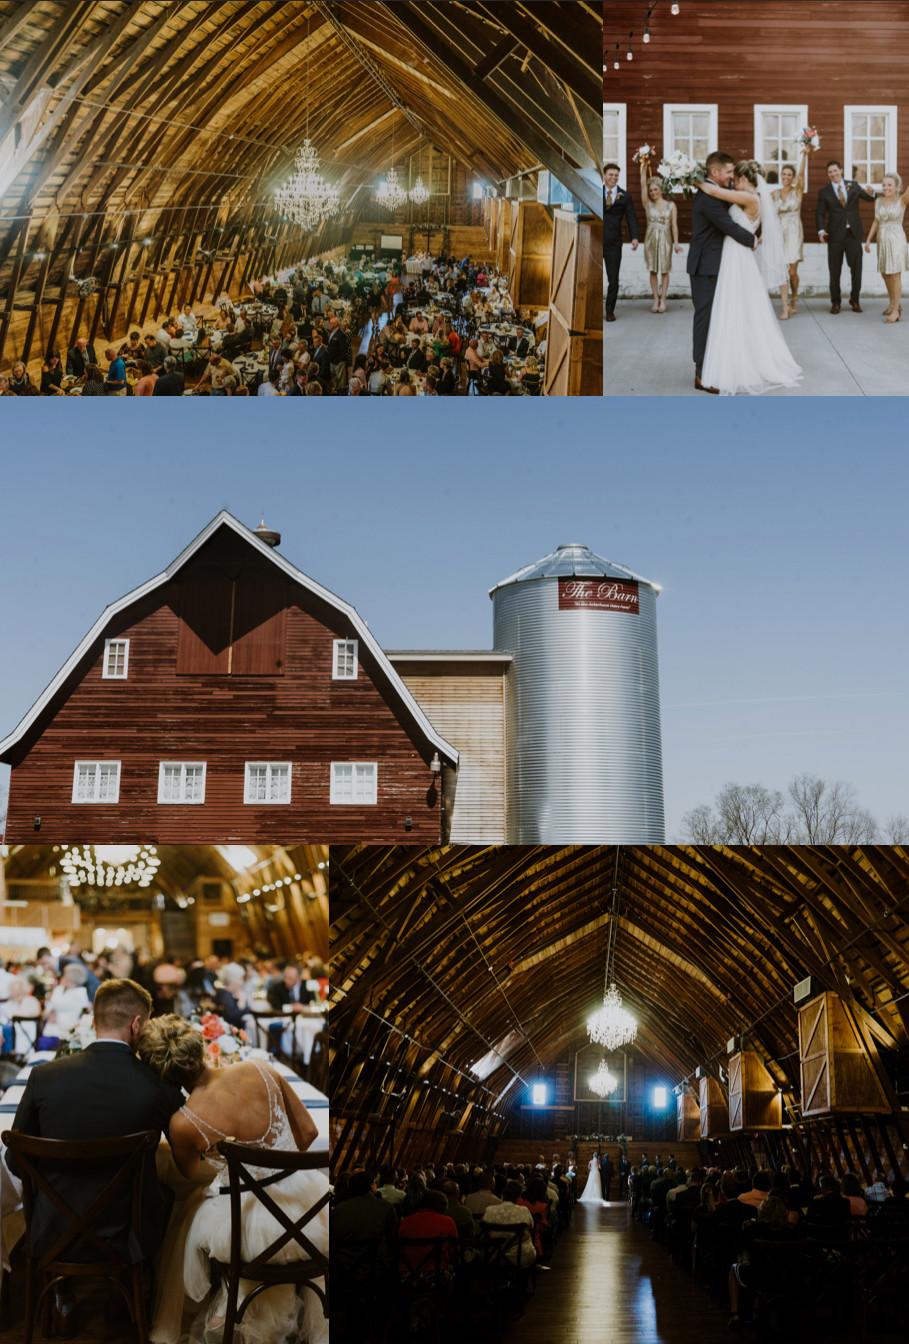 Omaha's Best Wedding Venues The Barn At Ackerhurst Dairy Farm